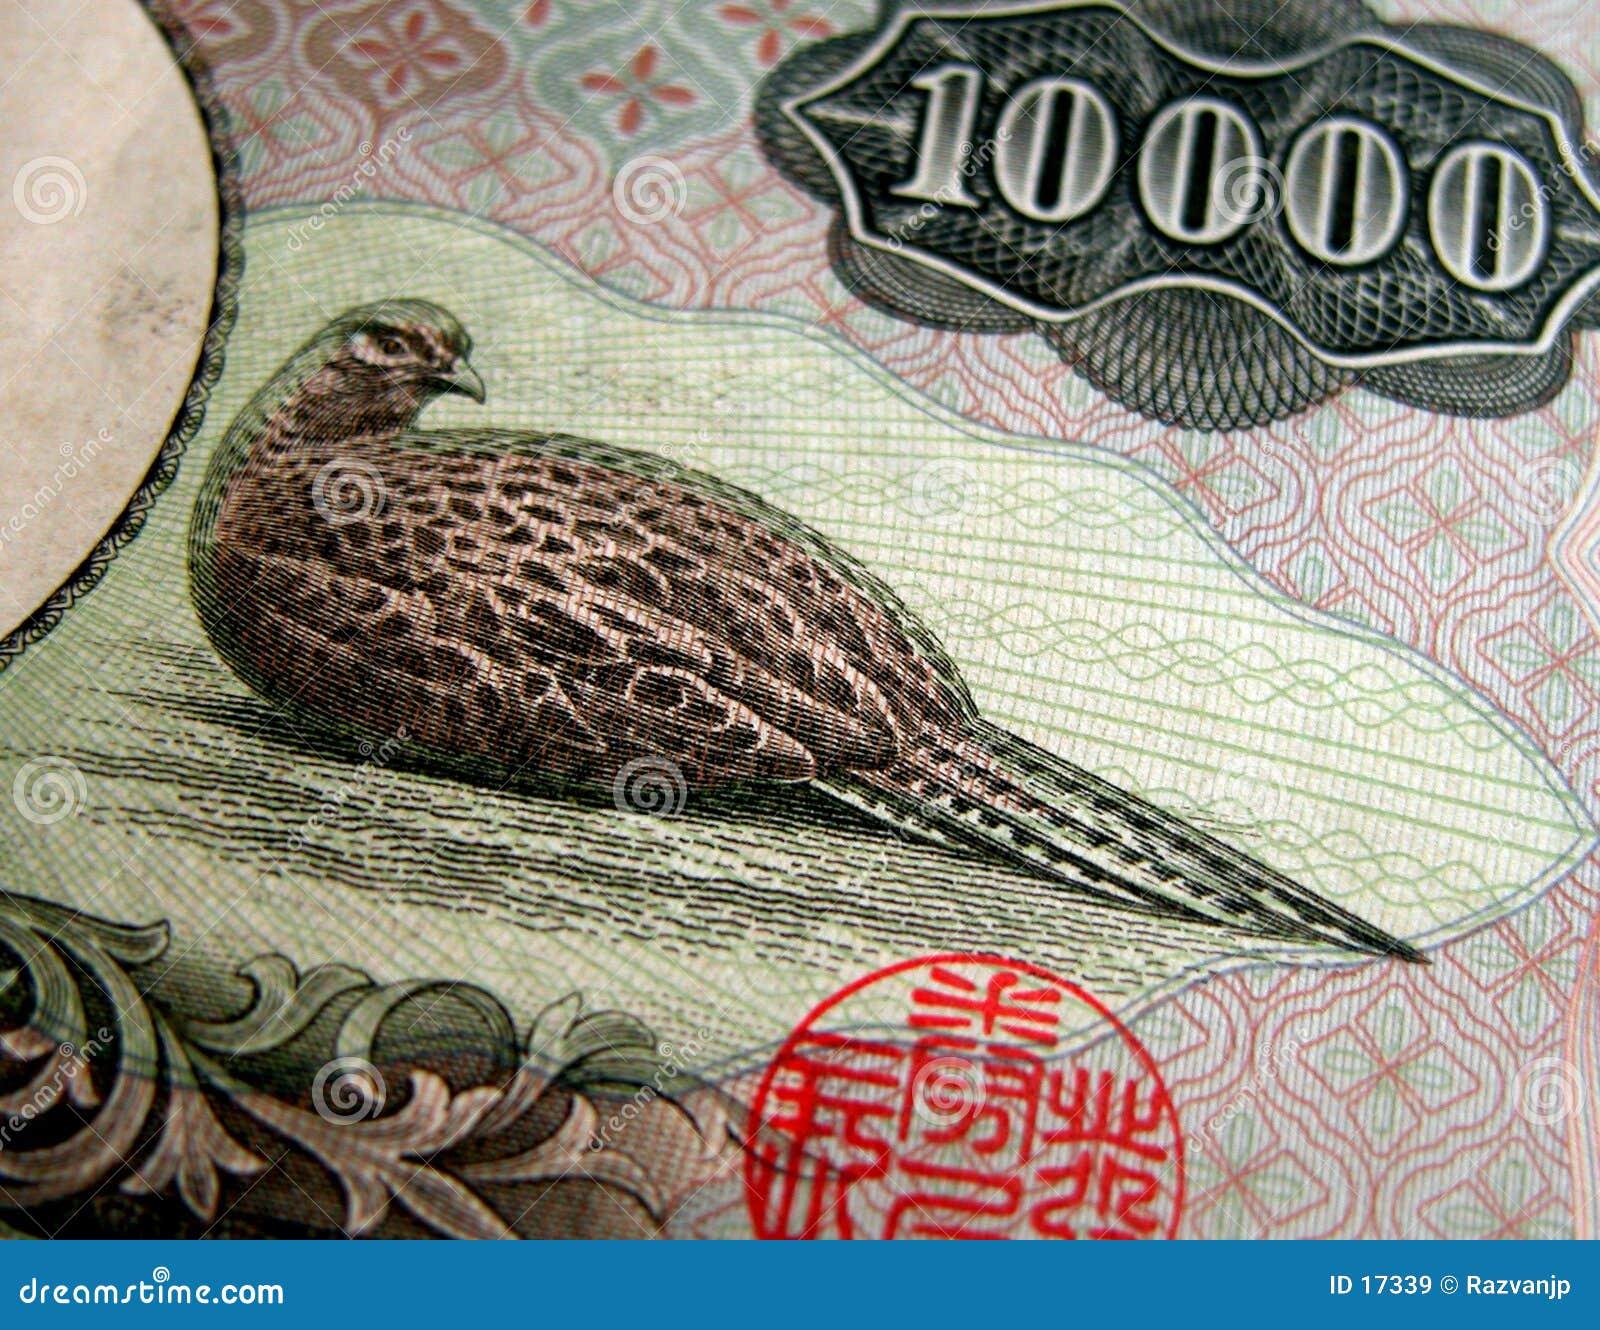 10000 Yentextuur